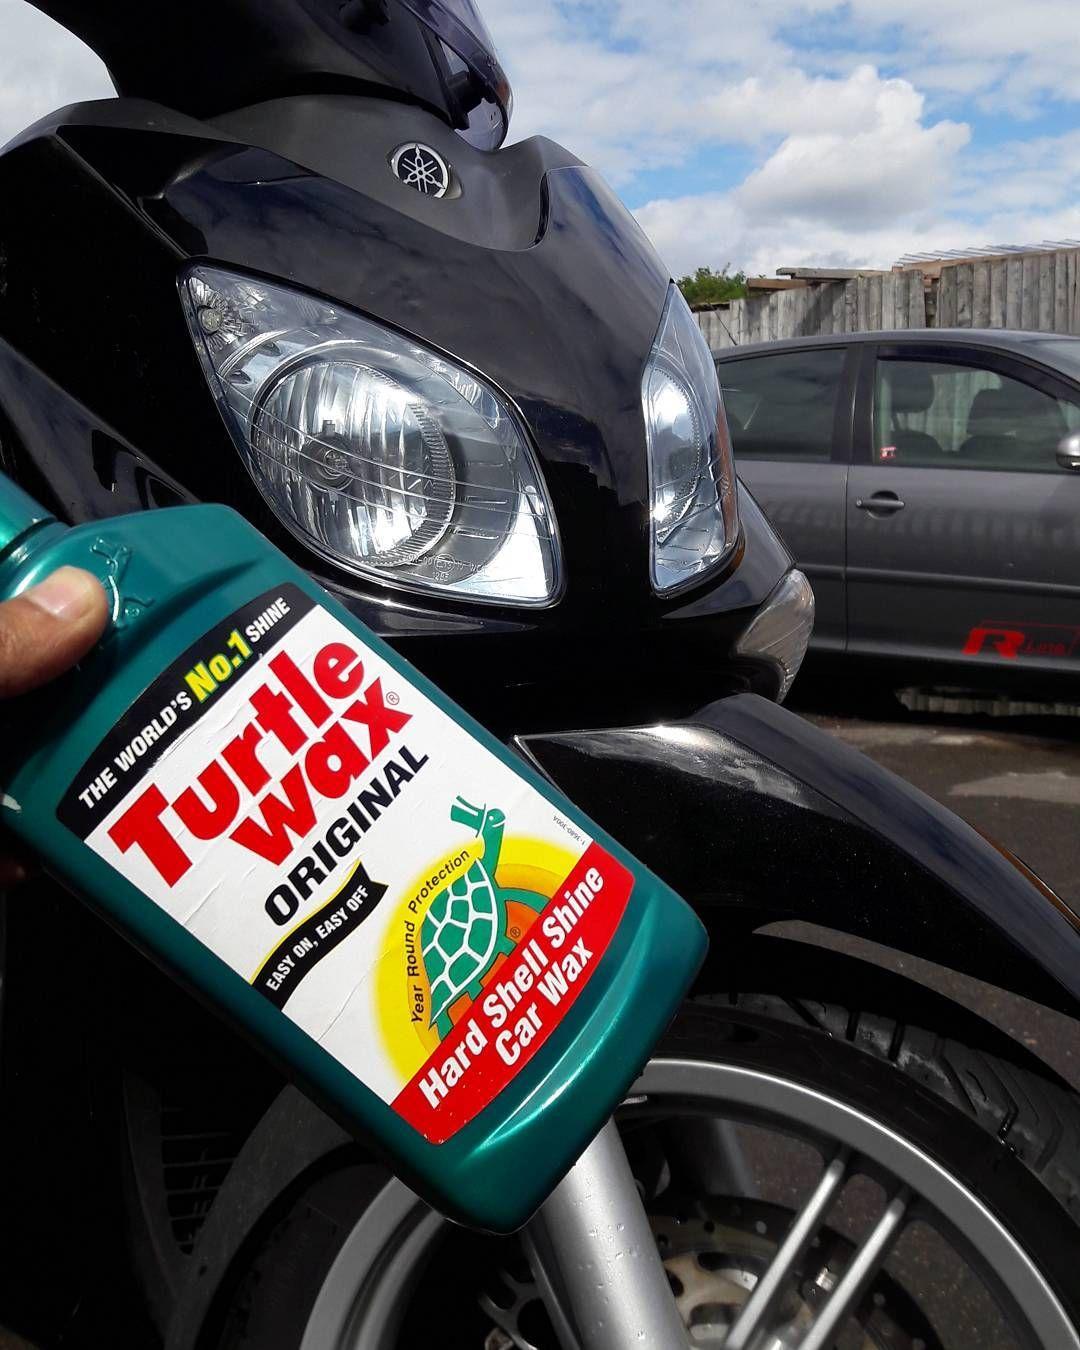 Sunday jobs wash wax cars & bikes full day job.